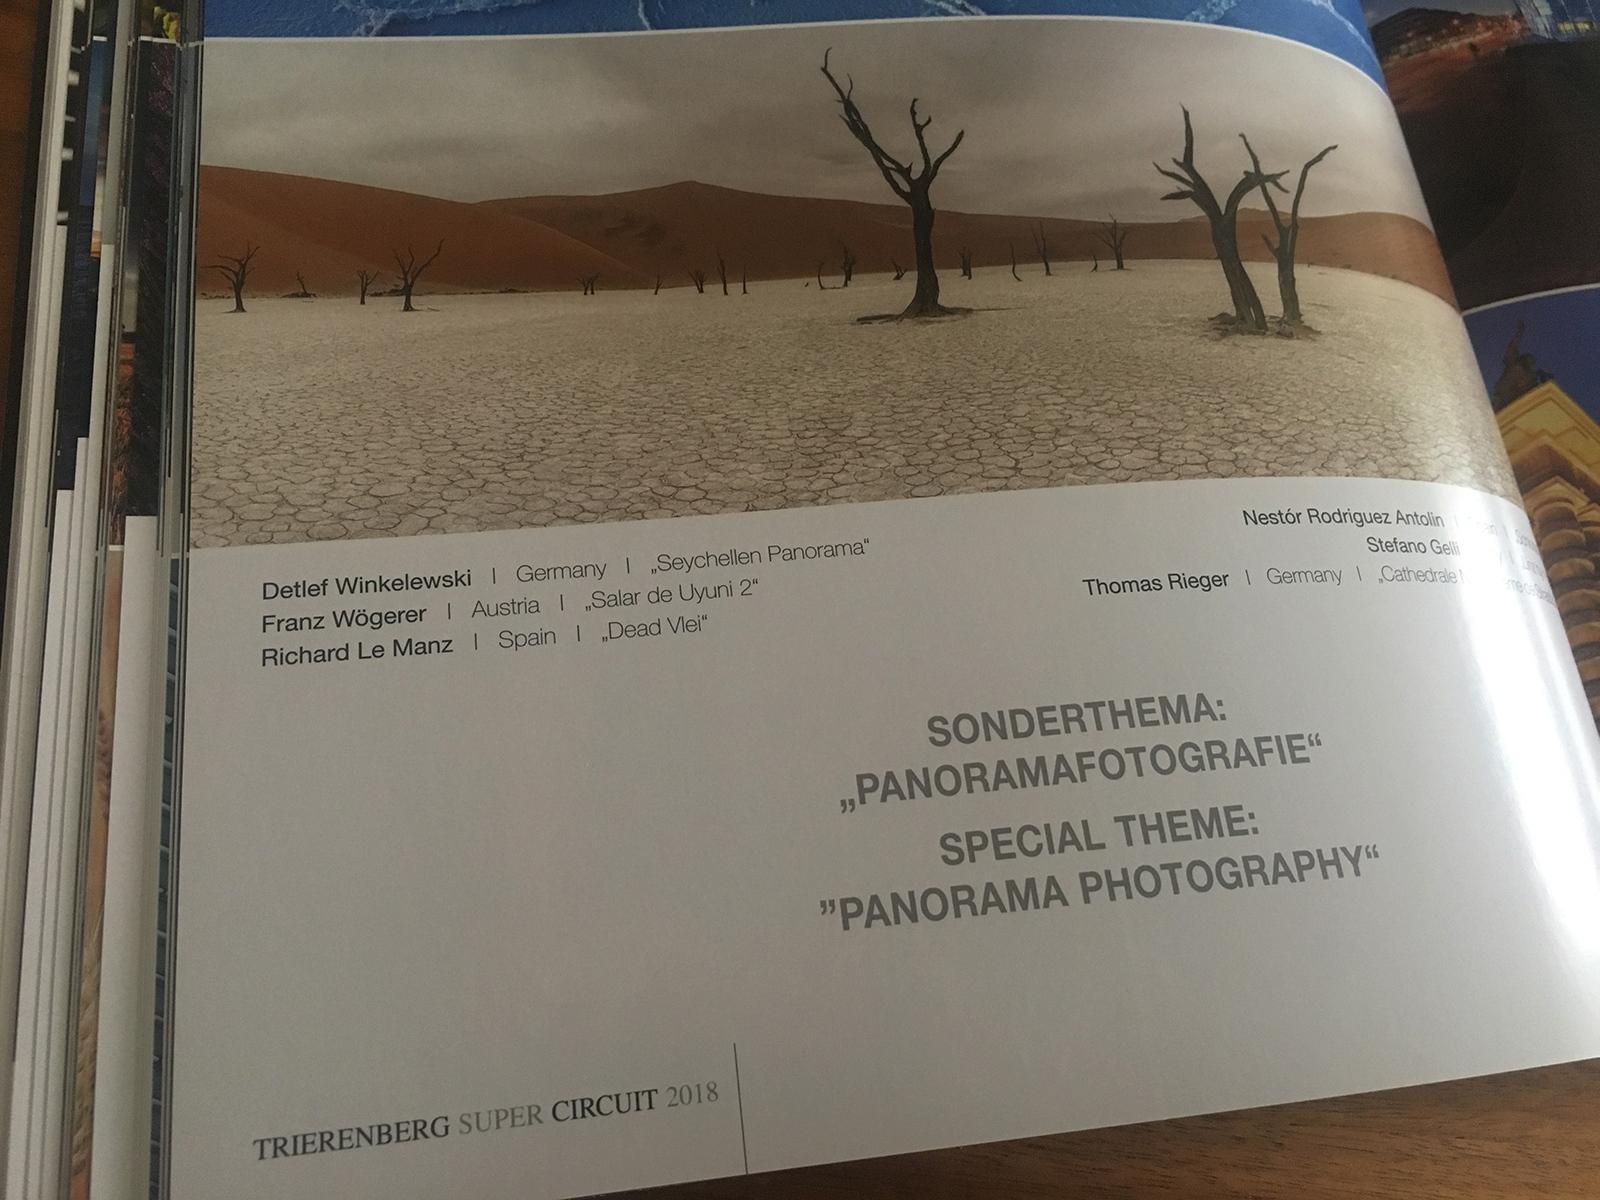 Art and Documentary Photography - Loading IMG_4177-Trierenberg.jpg